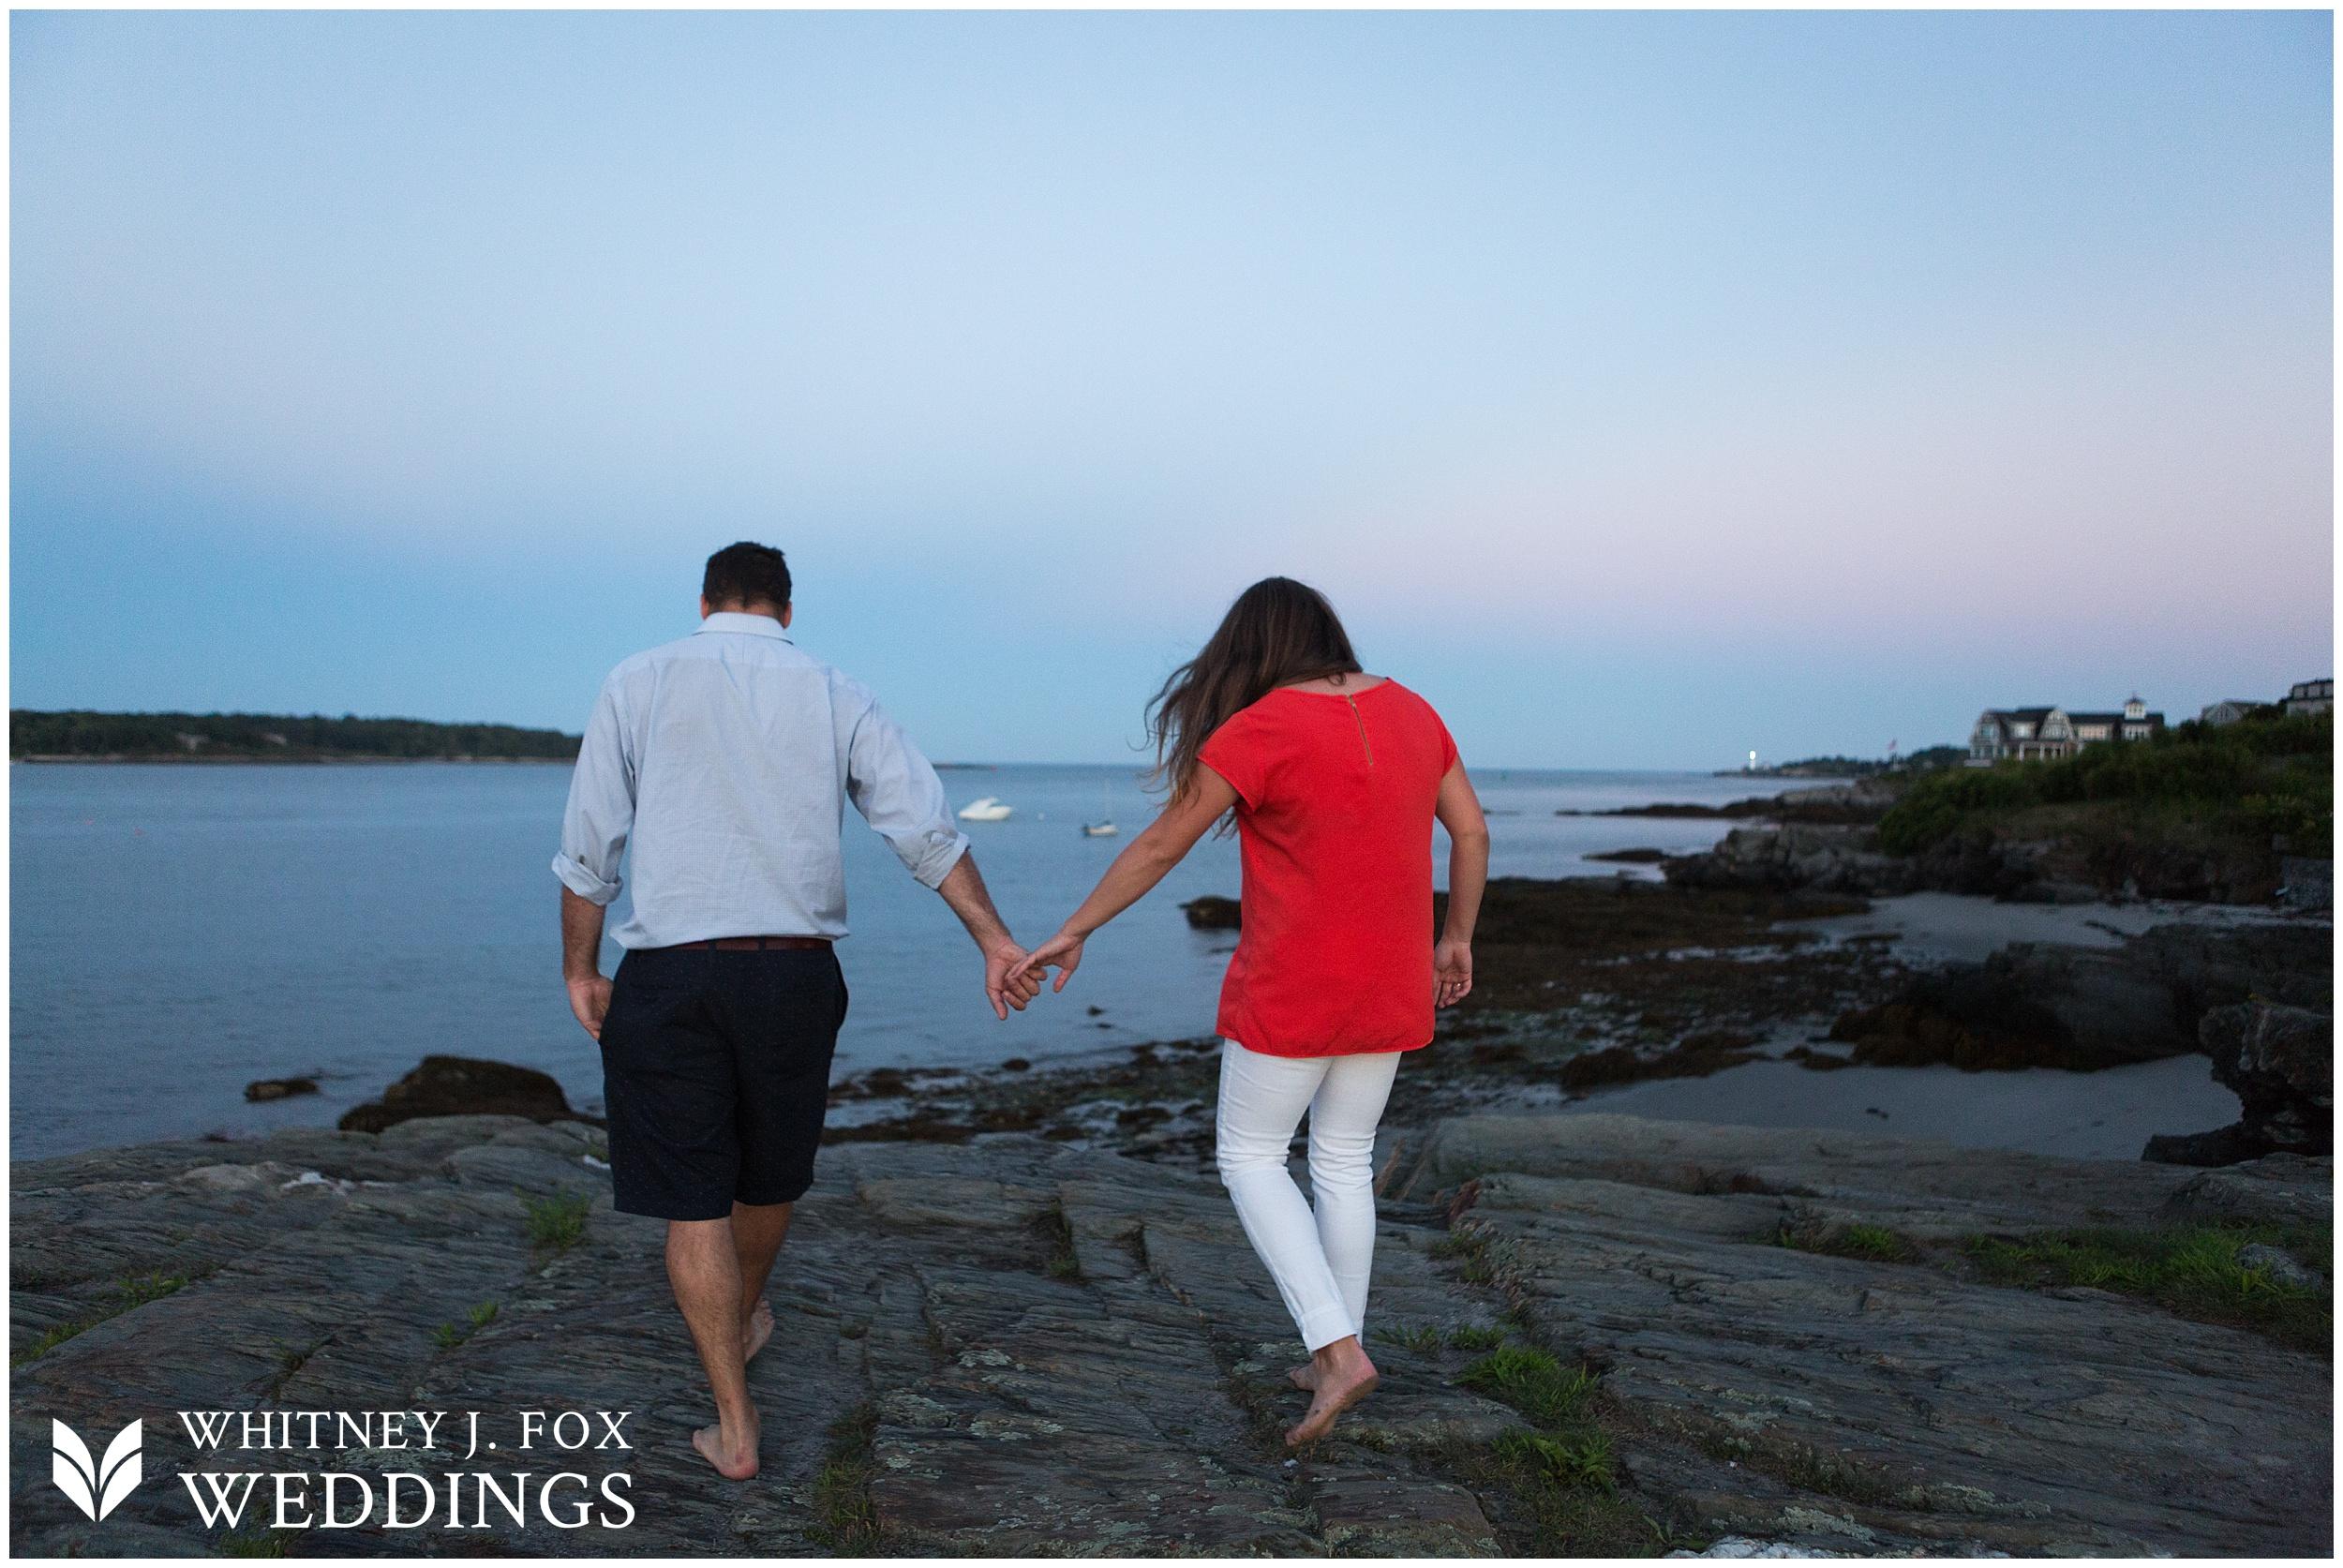 30_293_western_promenade_willard_beach_engagement_session_portland_maine_wedding_photographer_whitney_j_fox_2047.jpg